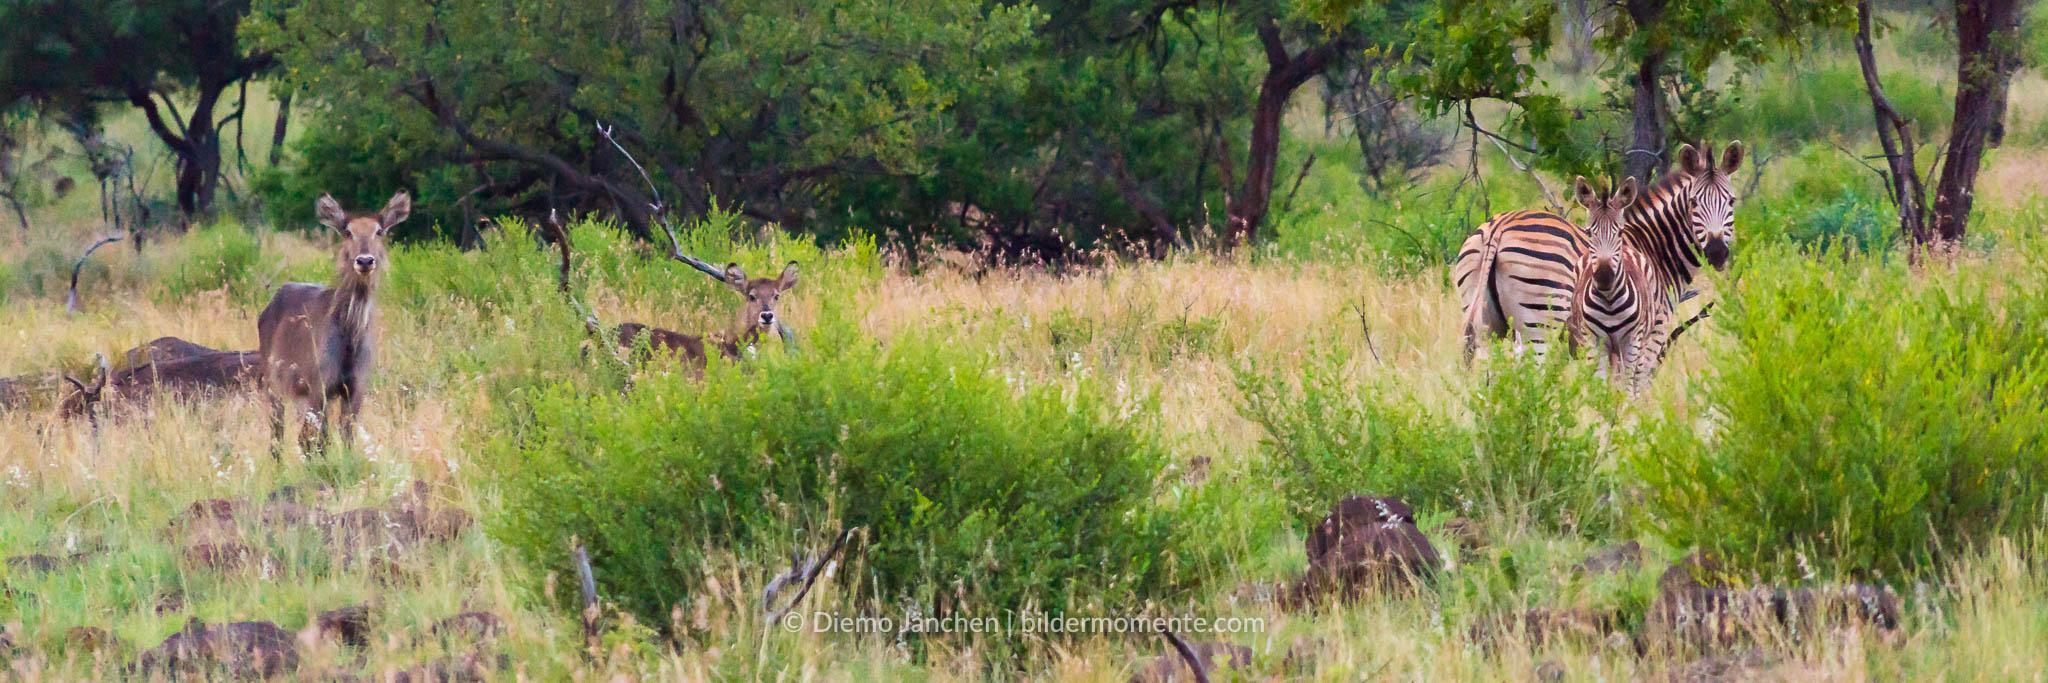 Steppenzebras und Nyala Antilope